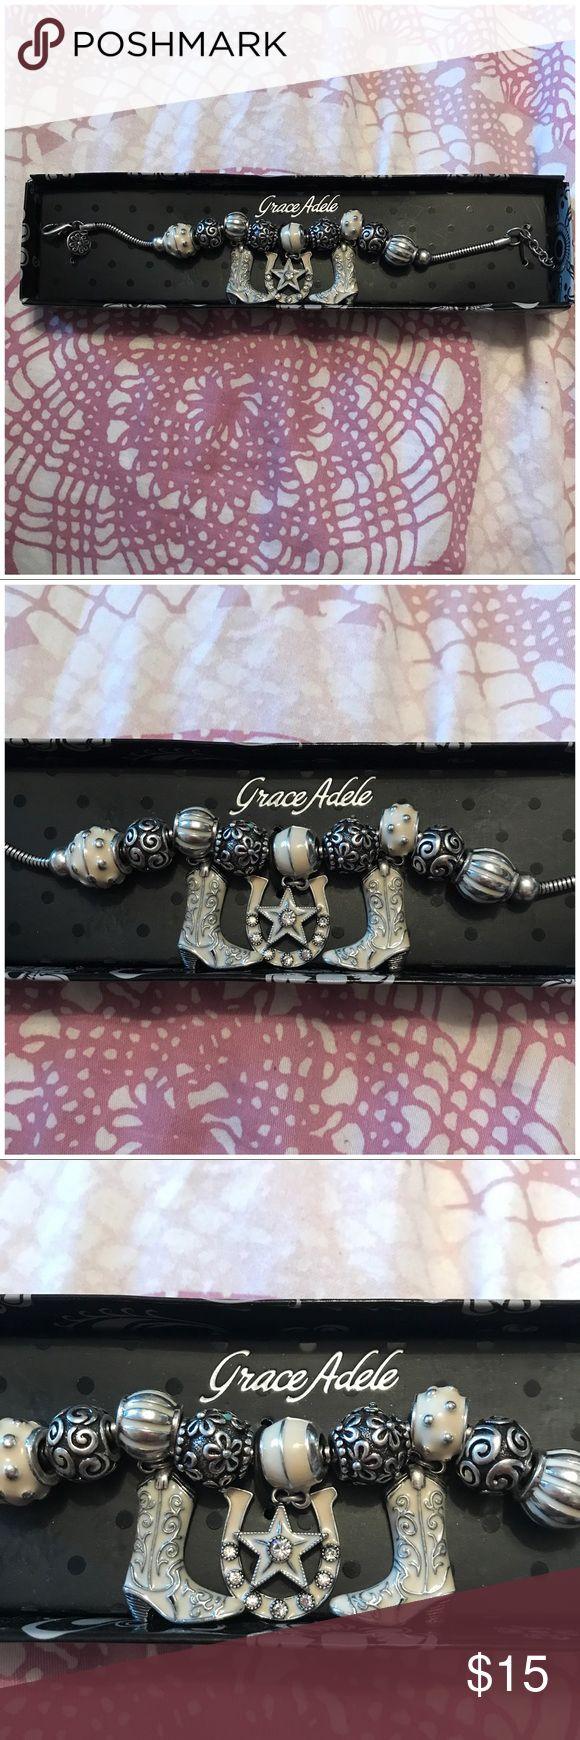 Grace Adele Cowgirl Stone Bracelet Super Cute Charm Bracelet Grace Adele Jewelry Bracelets